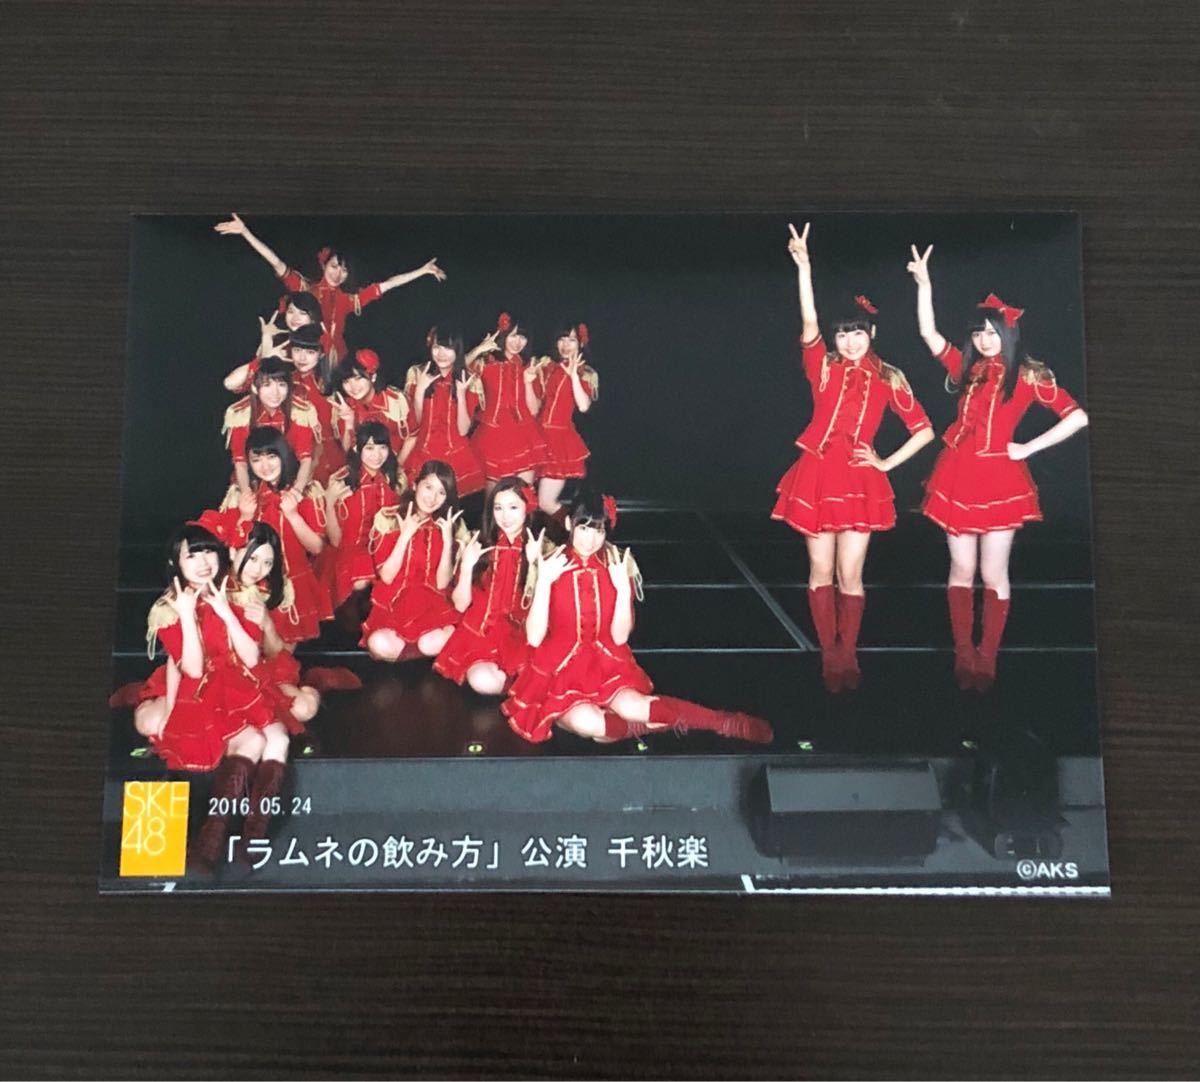 SKE48 チームk2 ラムネの飲み方公演 千秋楽 劇場公演 撮って出し 集合 生写真